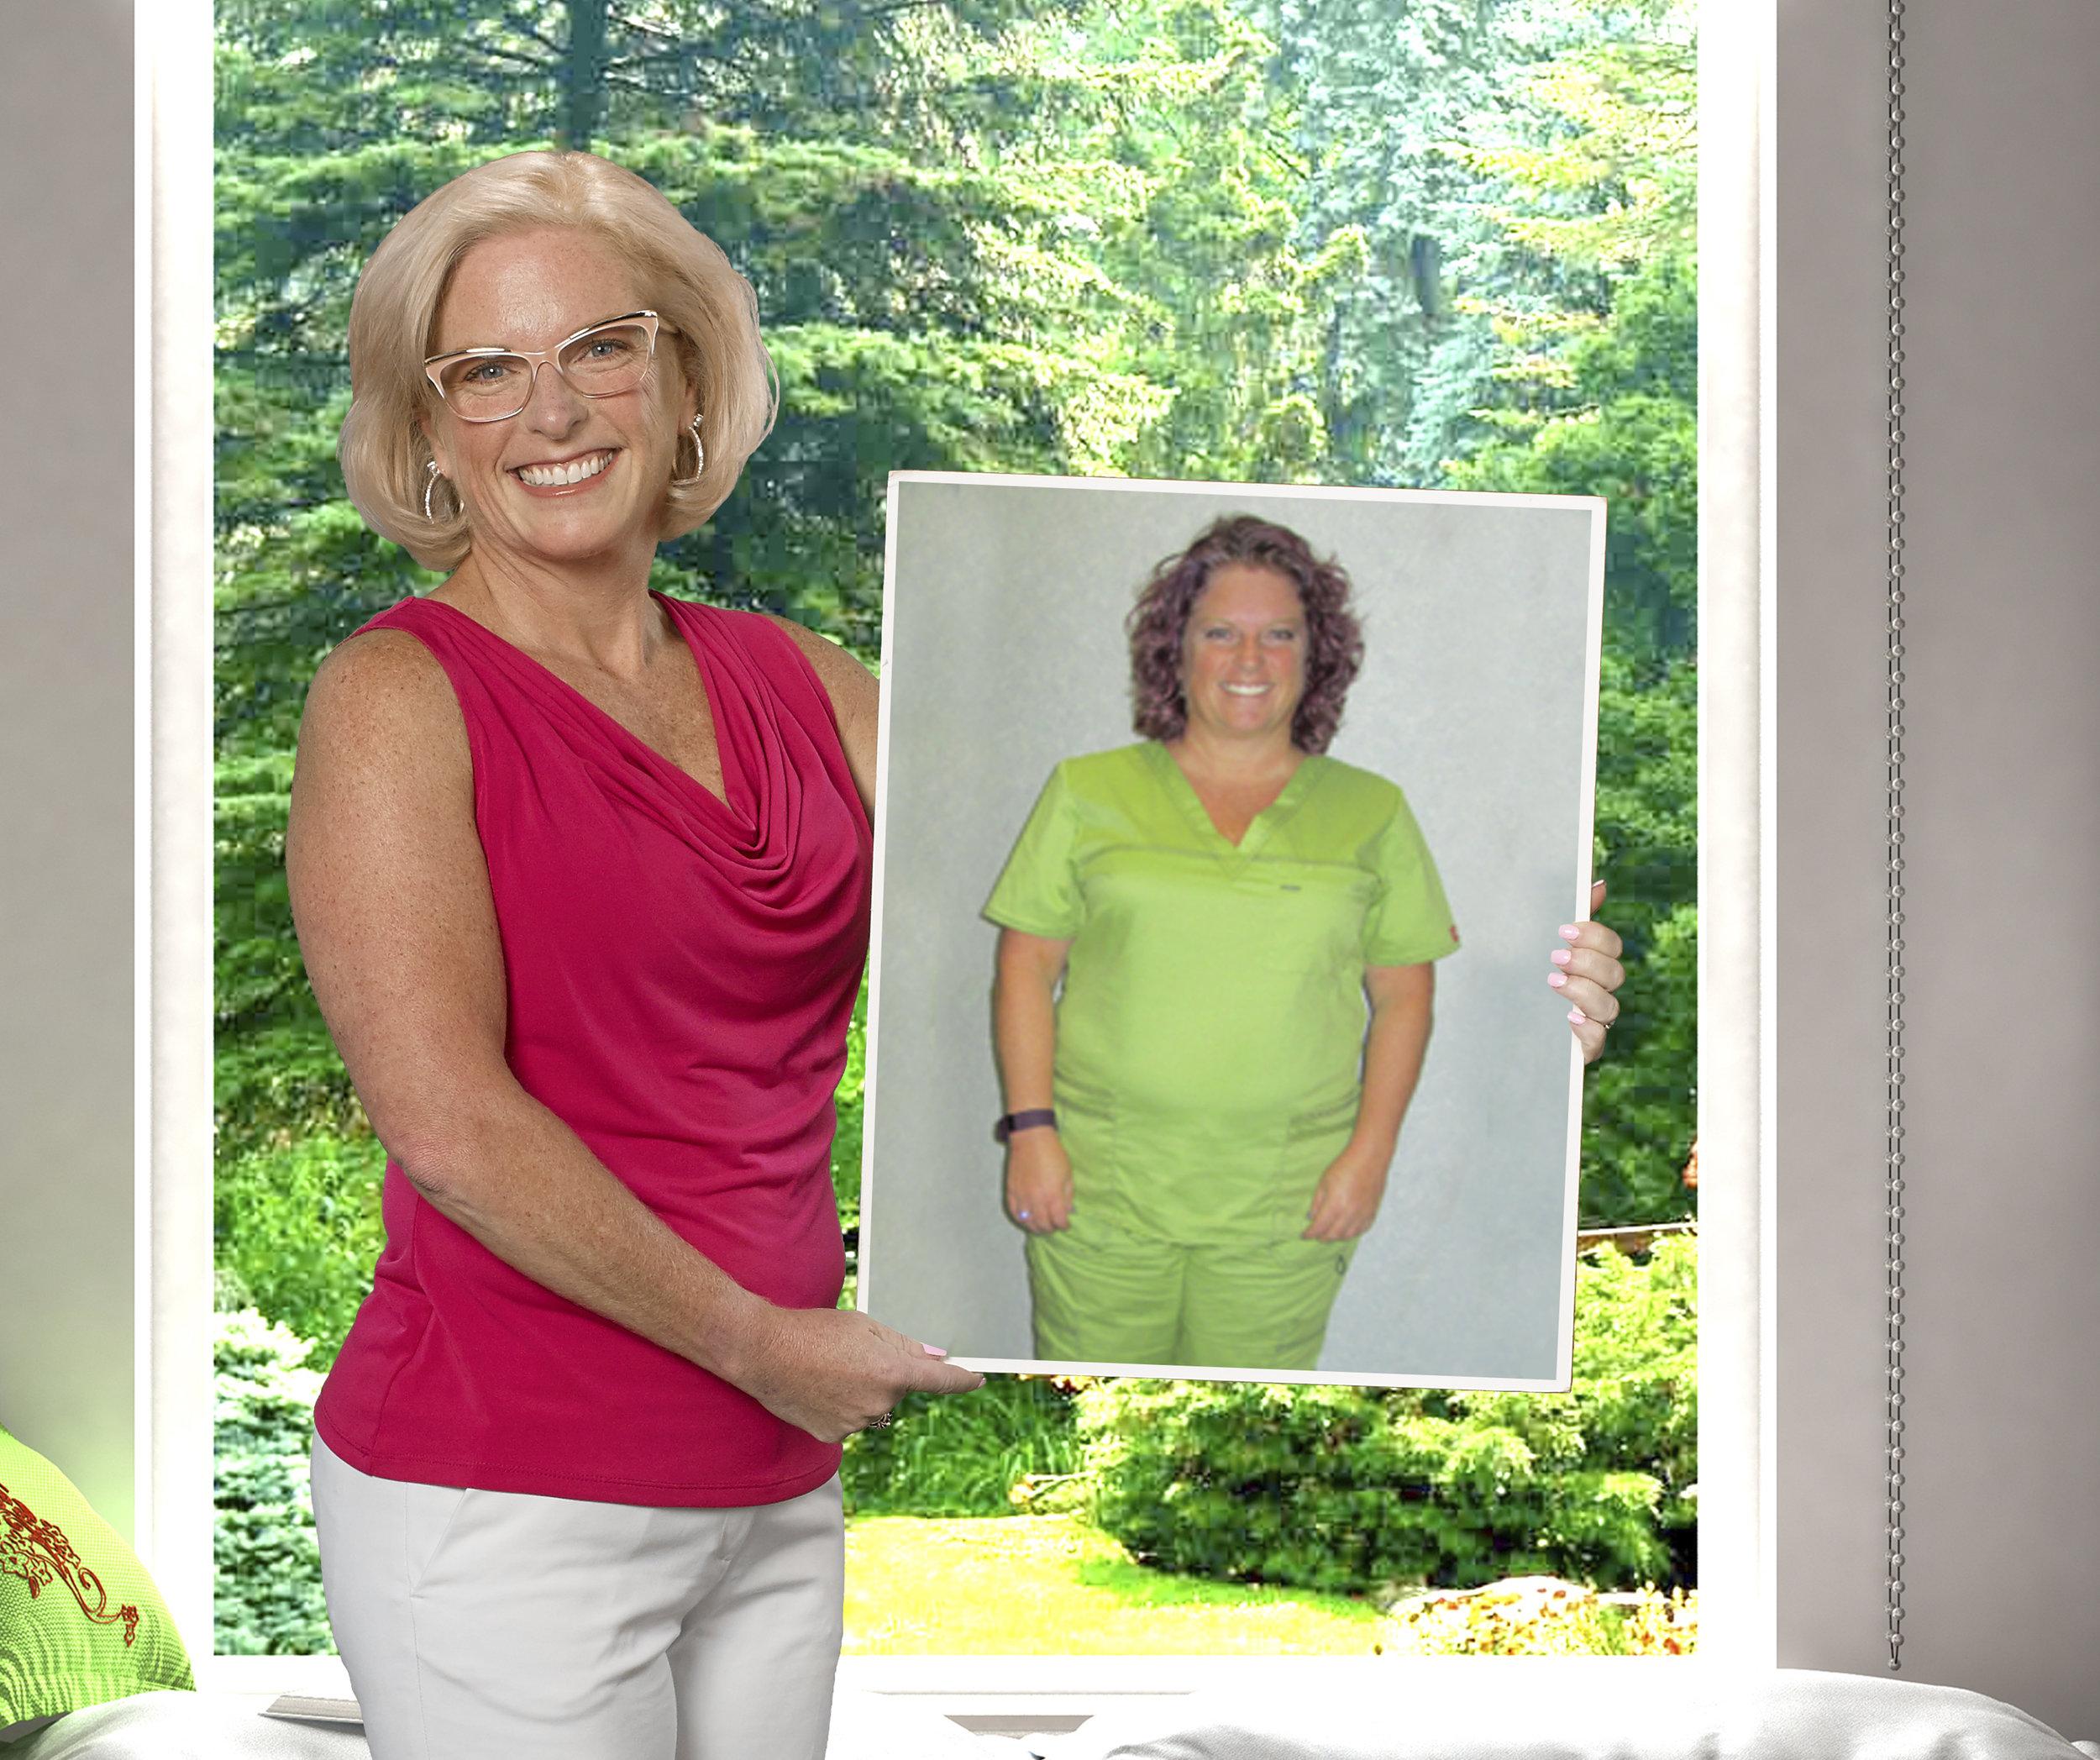 Kelly H. - lost 59 lbs. in 26 weeks at MWLC Warren*